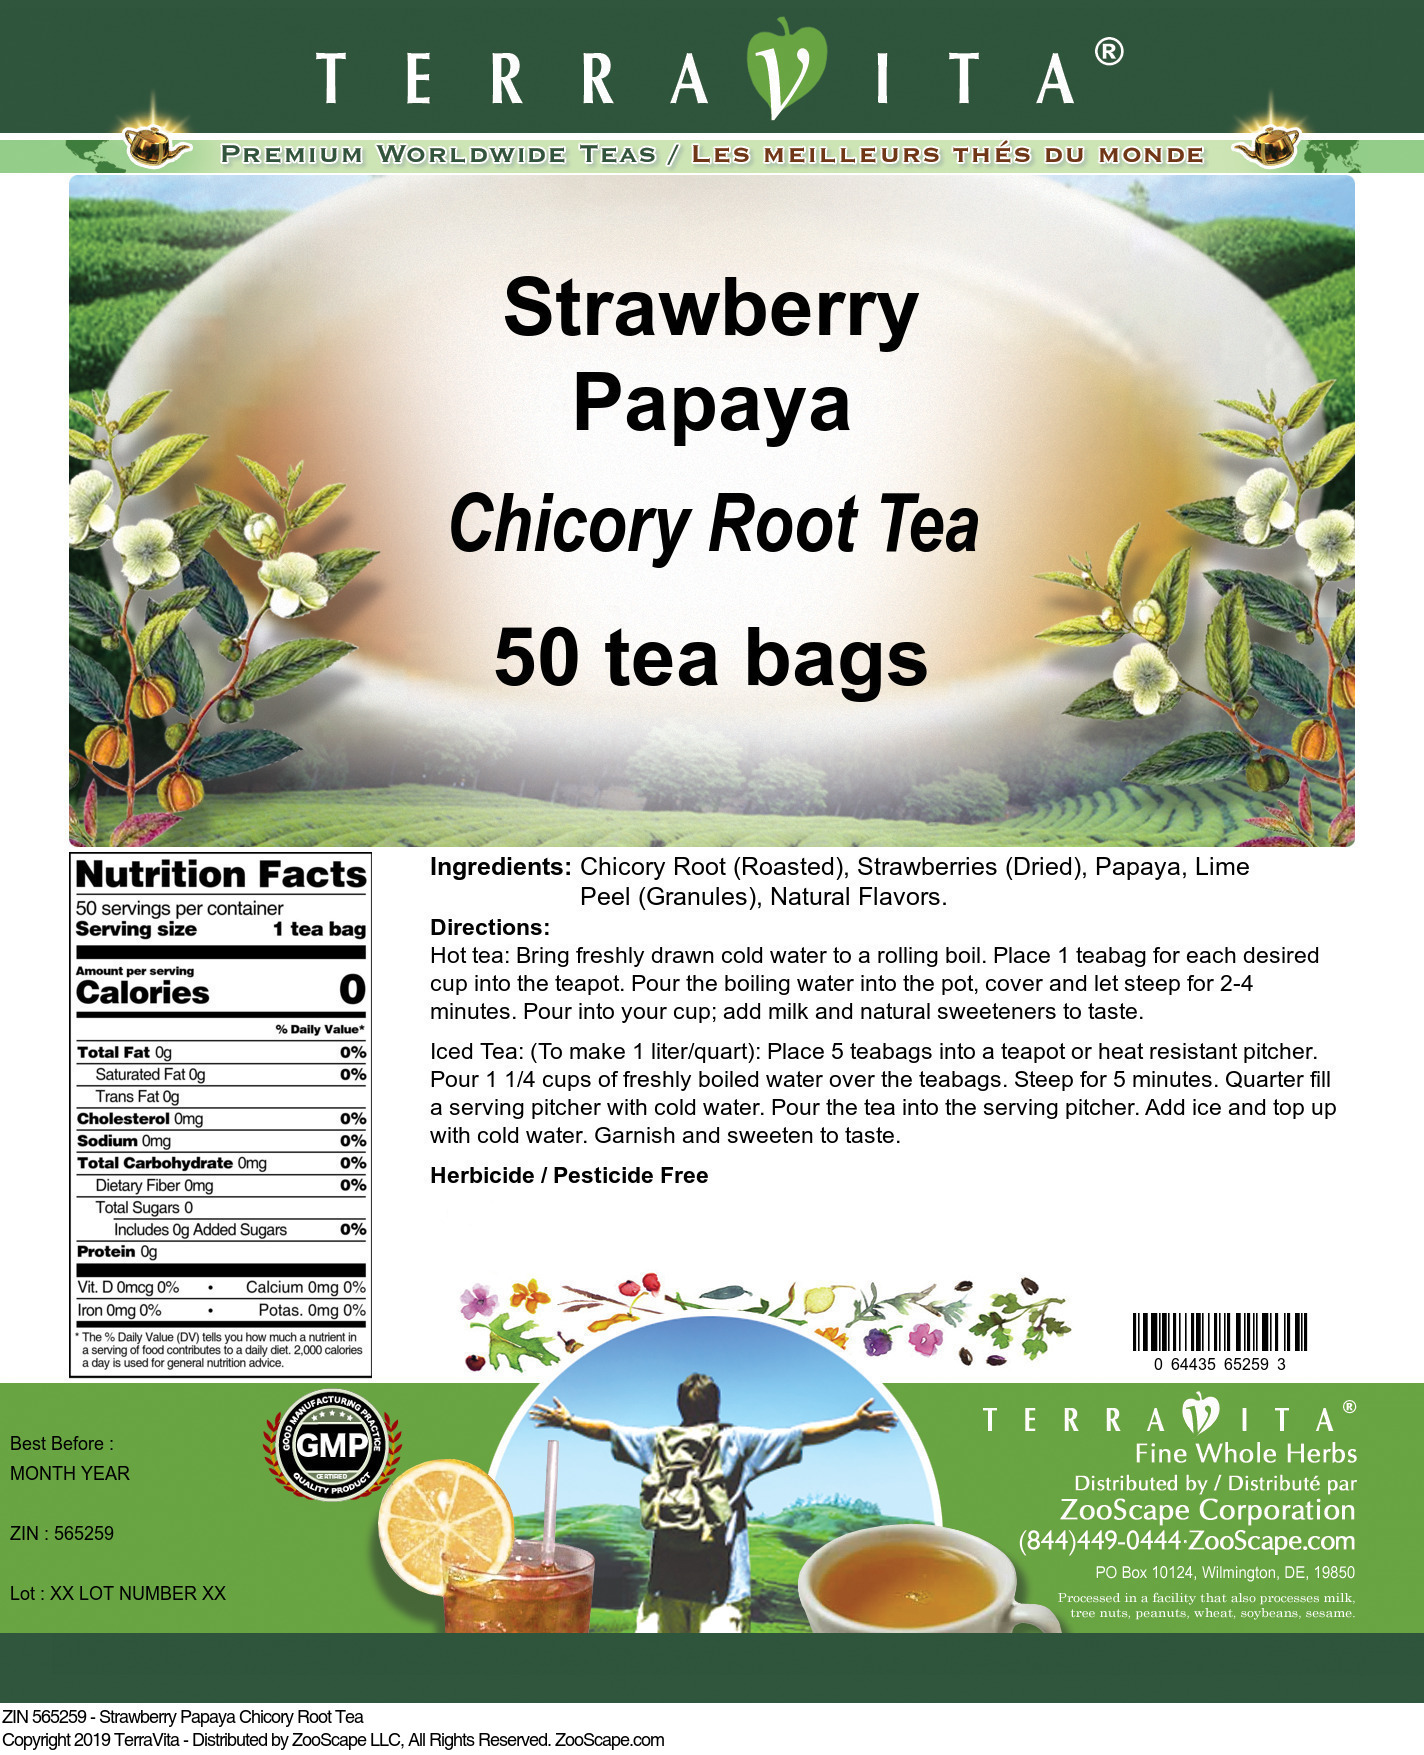 Strawberry Papaya Chicory Root Tea